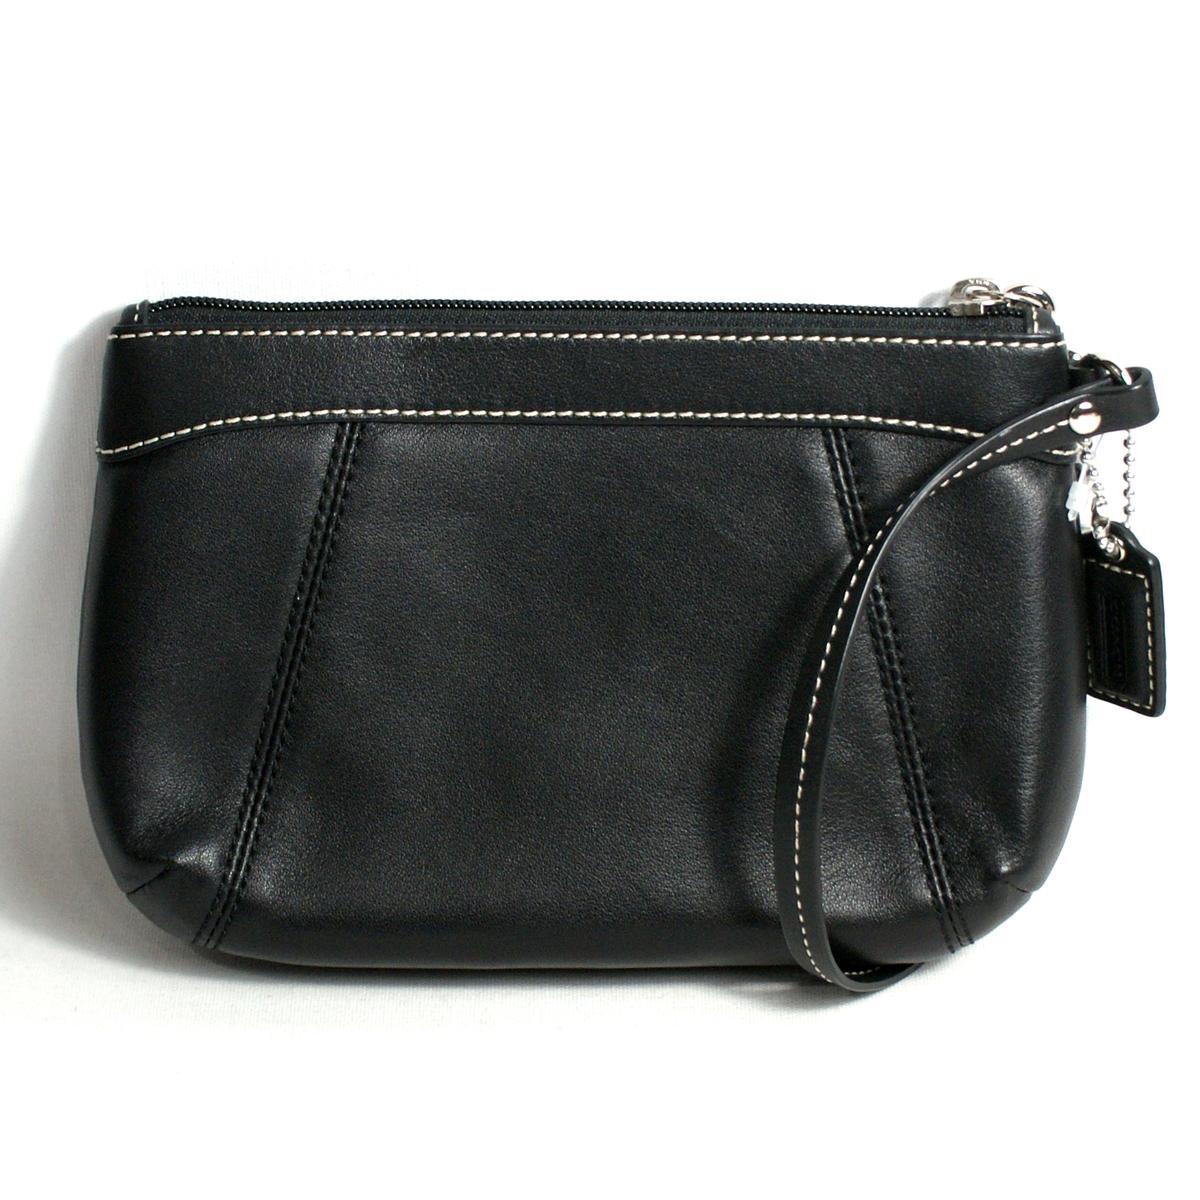 Coach Black Leather Pleated Medium Wristlet #46484   Coach 46484